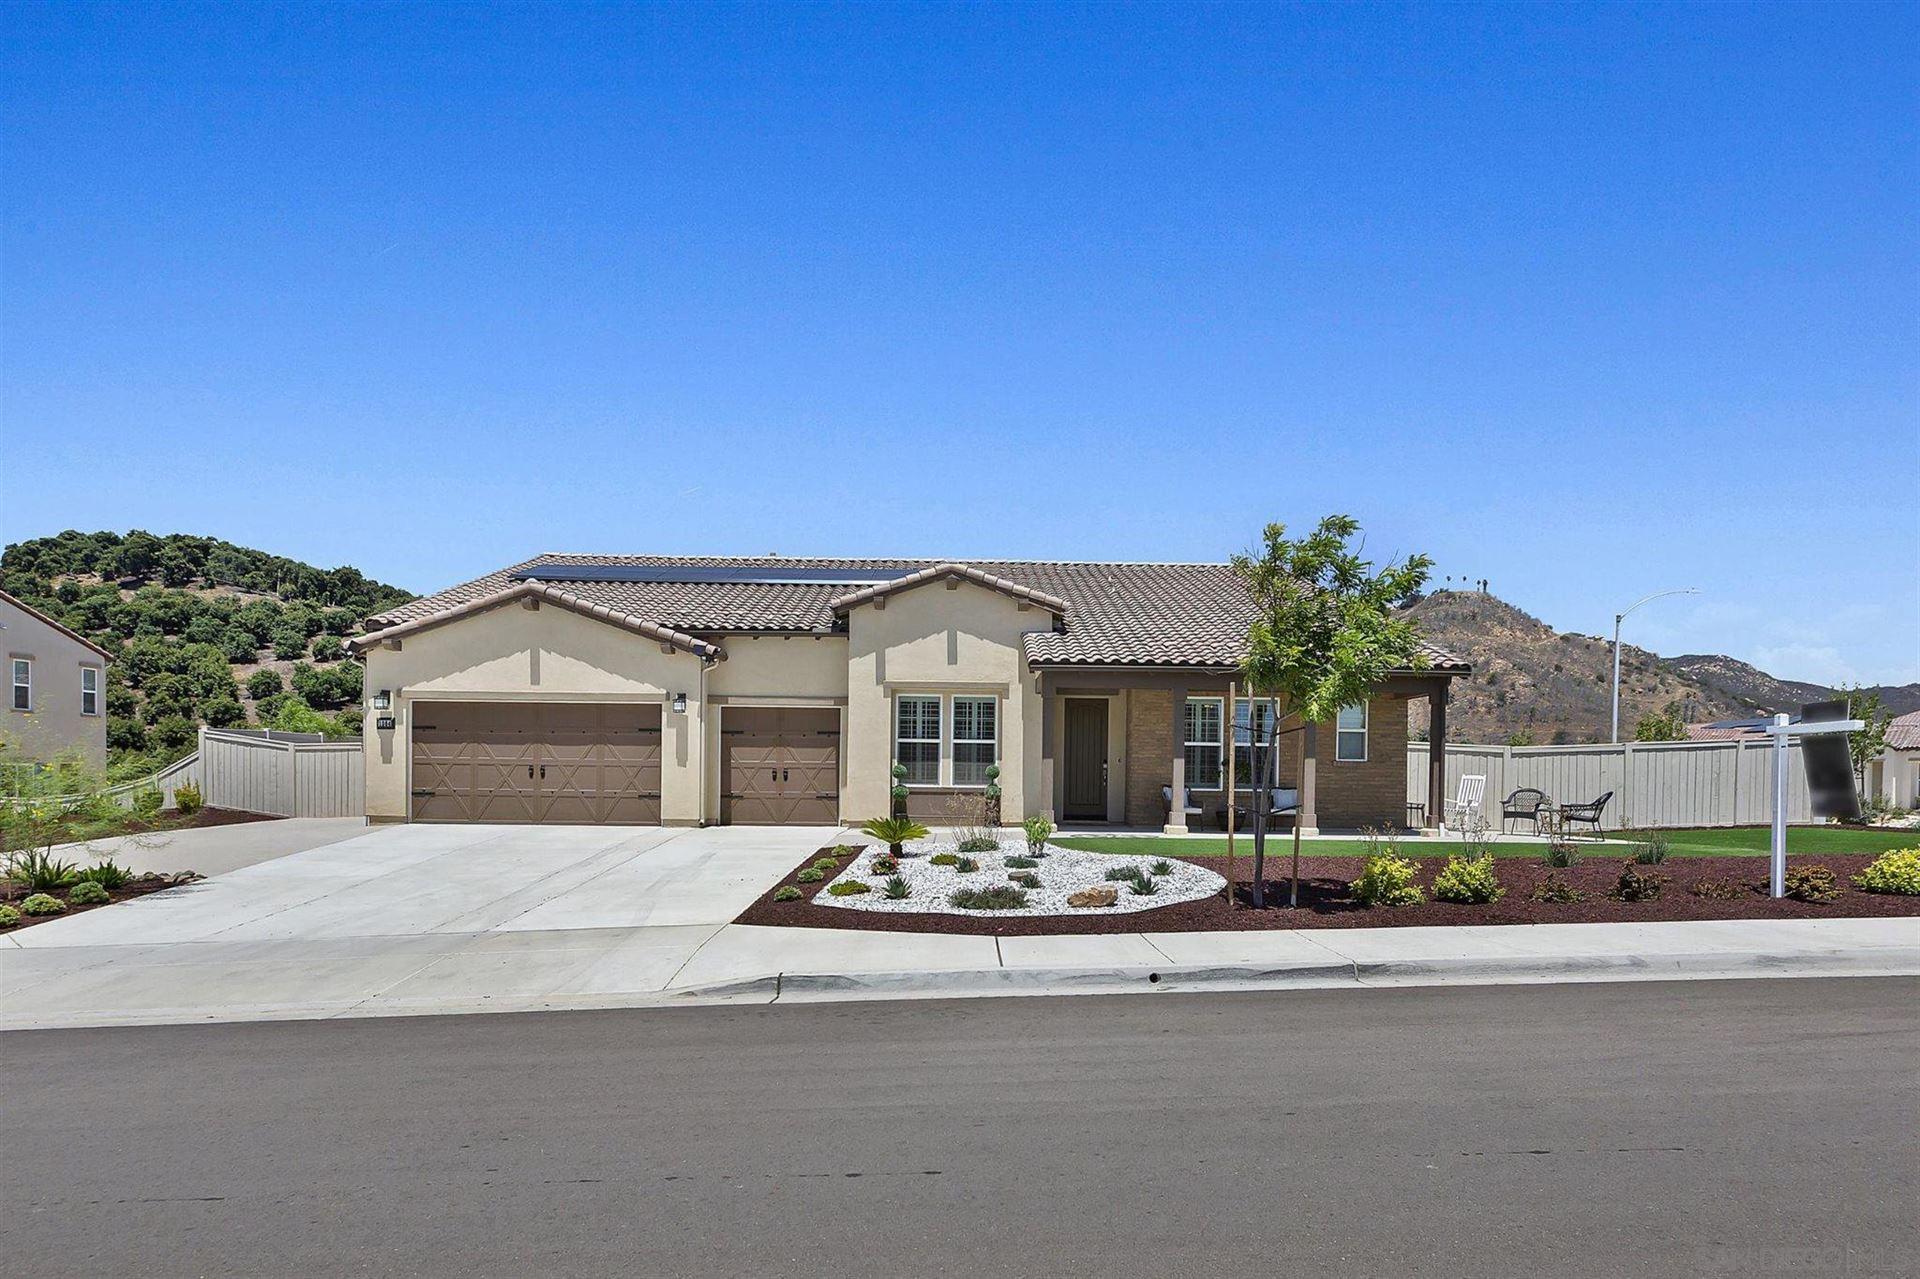 Photo of 1364 Vista Ave, Escondido, CA 92026 (MLS # 210021519)